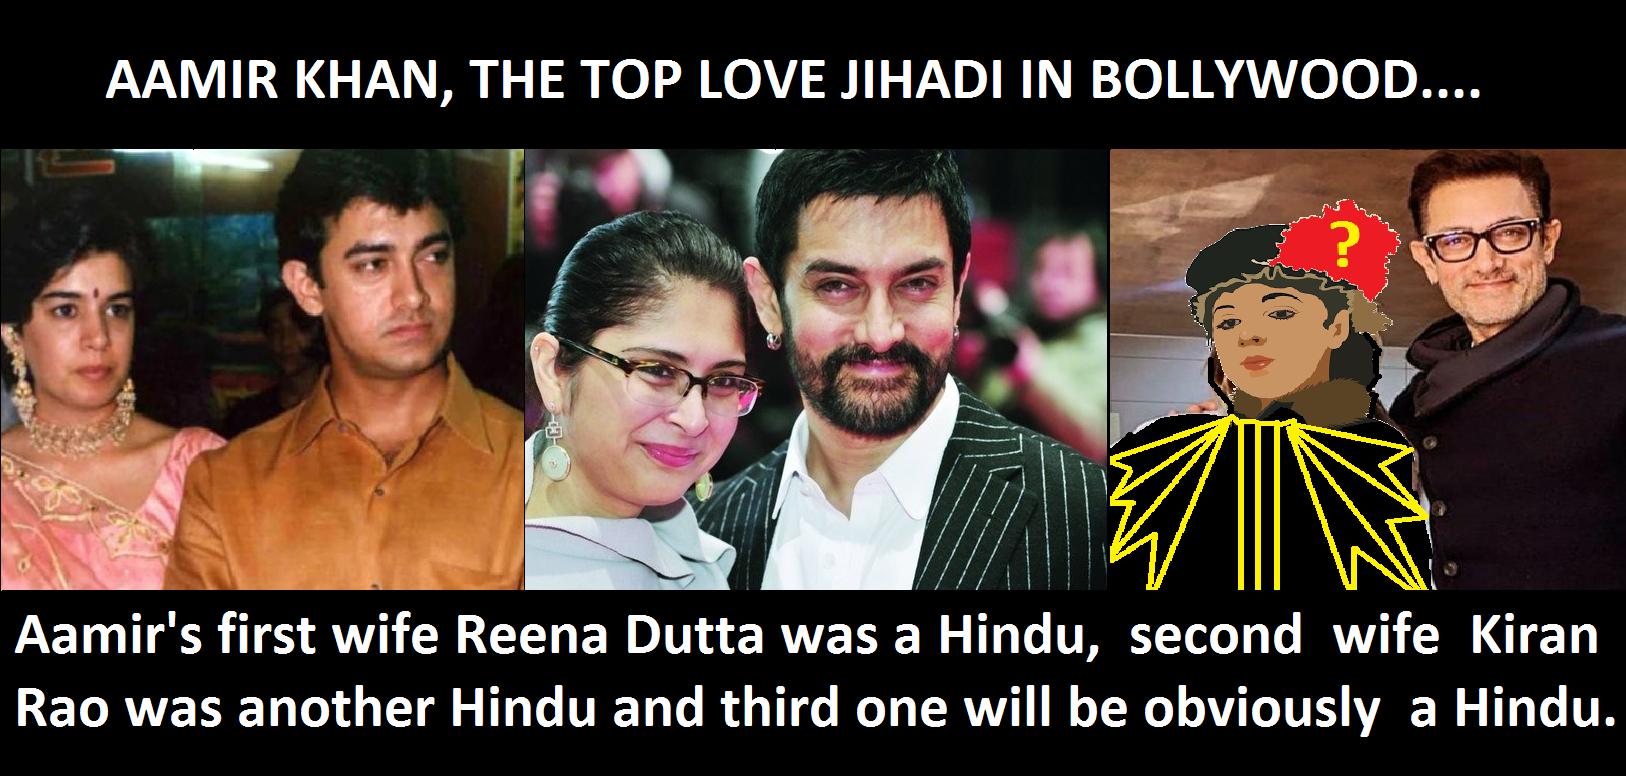 Aamir Khan - The Top Love Jihadi in Bollywood